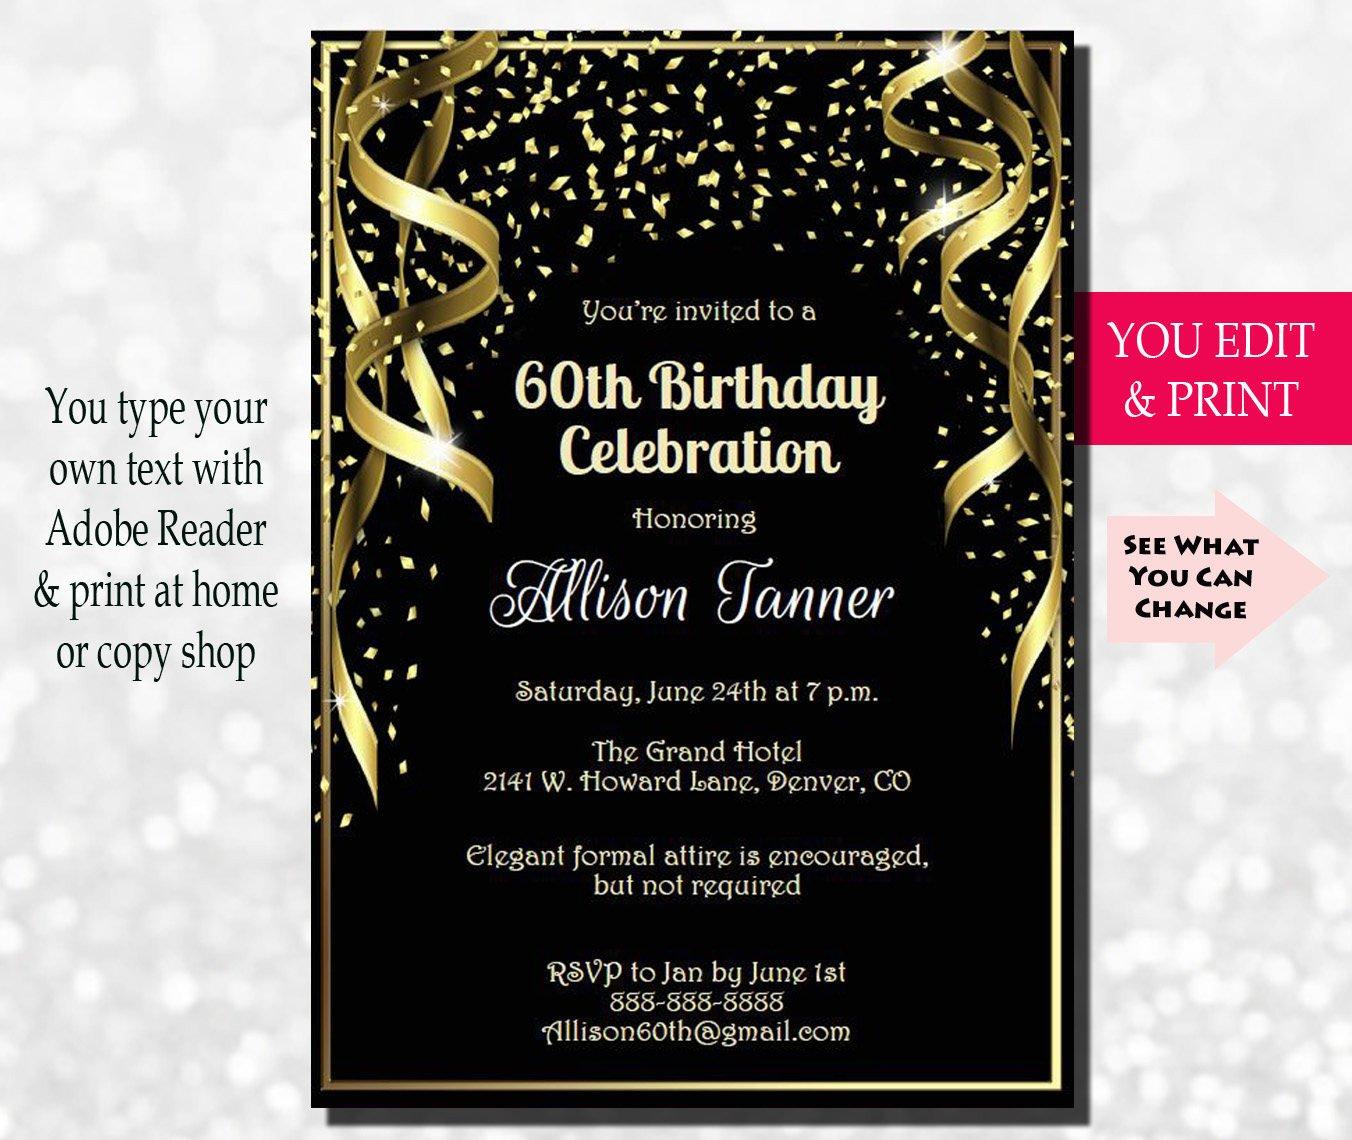 60th Birthday Invitations Template 60th Birthday Invitation 60th Birthday Party Invitation 60th